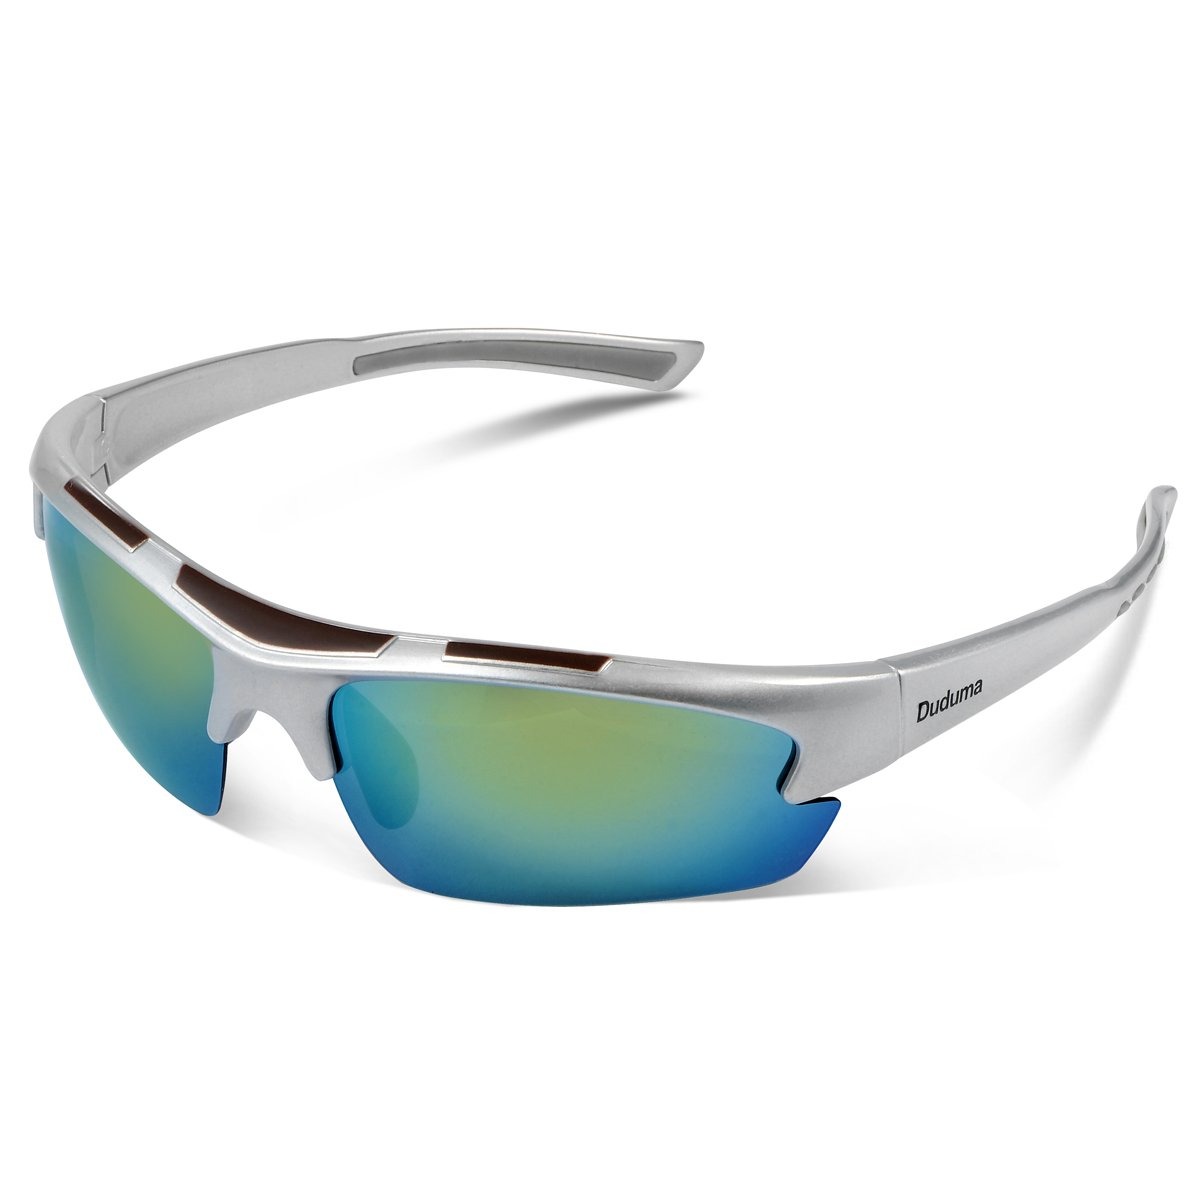 Duduma Polarized Designer Fashion Sports Sunglasses for Baseball Cycling Fishing Golf Tr62 Superlight Frame (Silver/Yellow) by Duduma